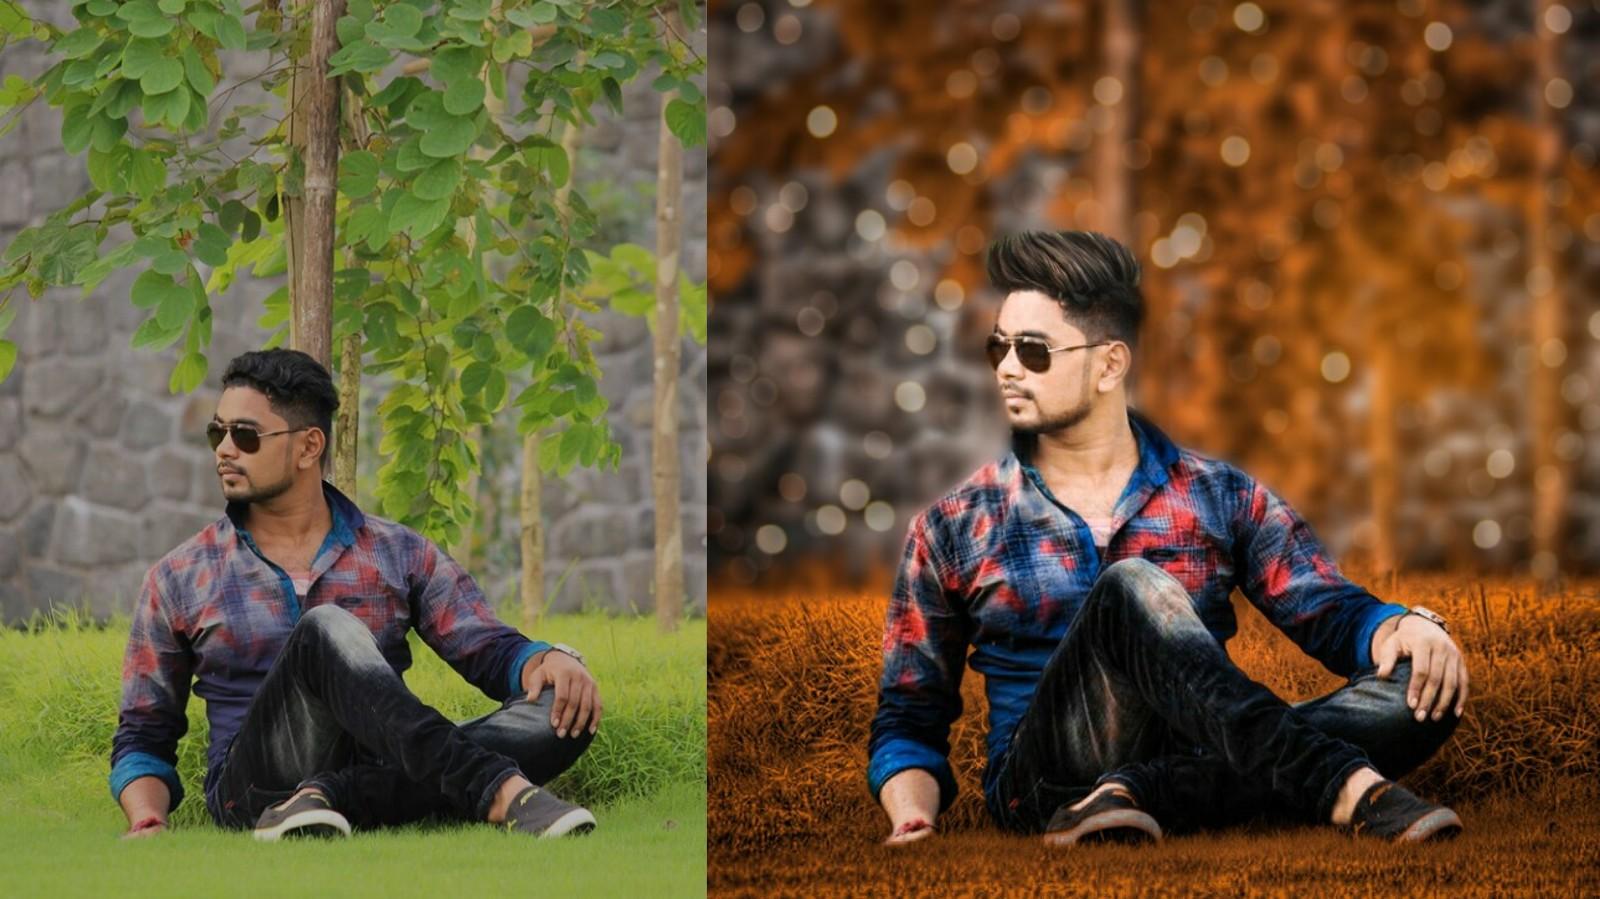 Photo stylish editing apps fotos